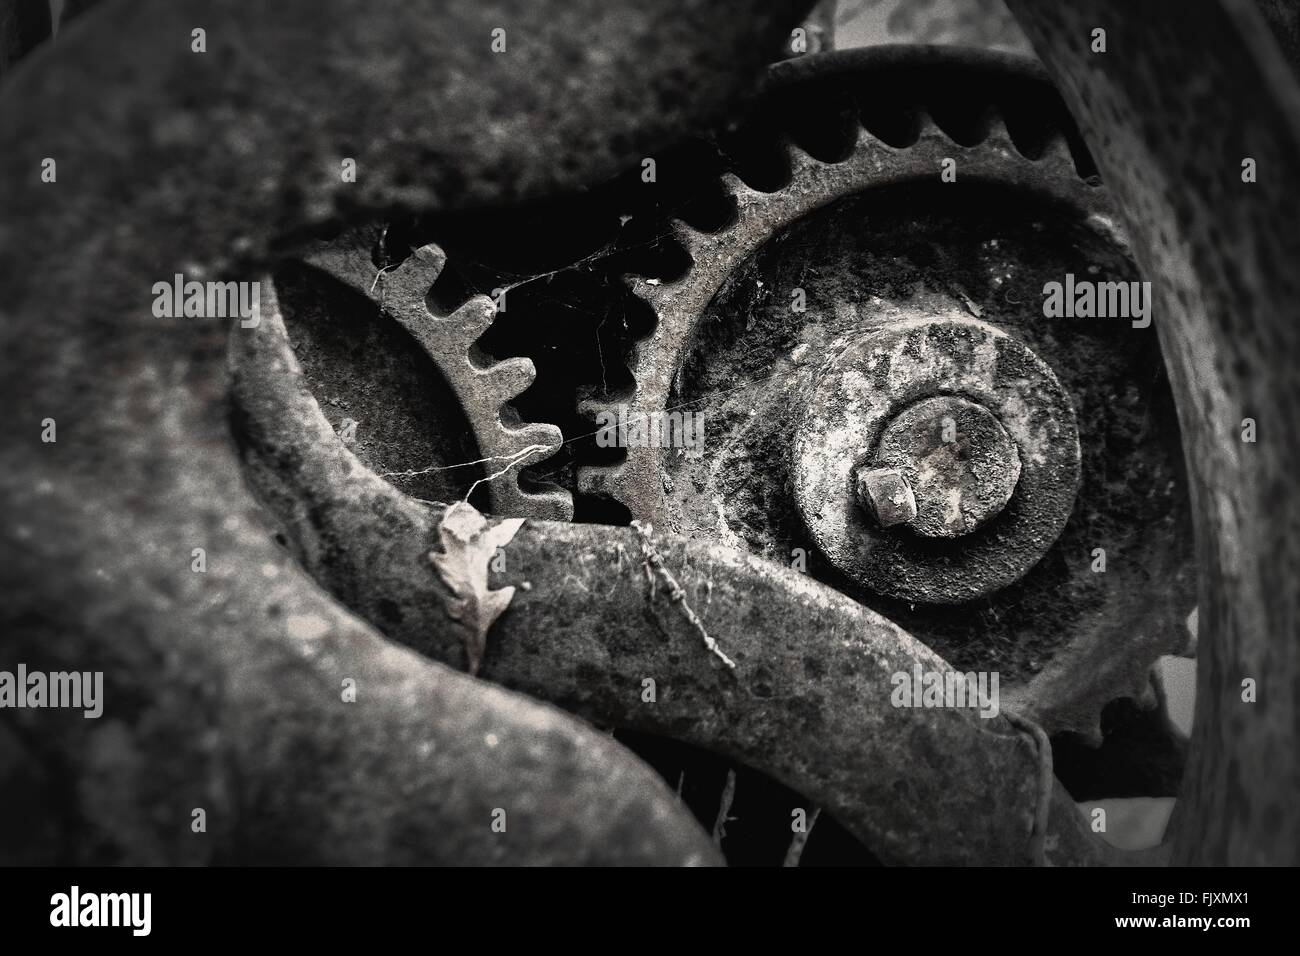 Close-Up Of Rusty Abandoned Machine Part Stock Photo